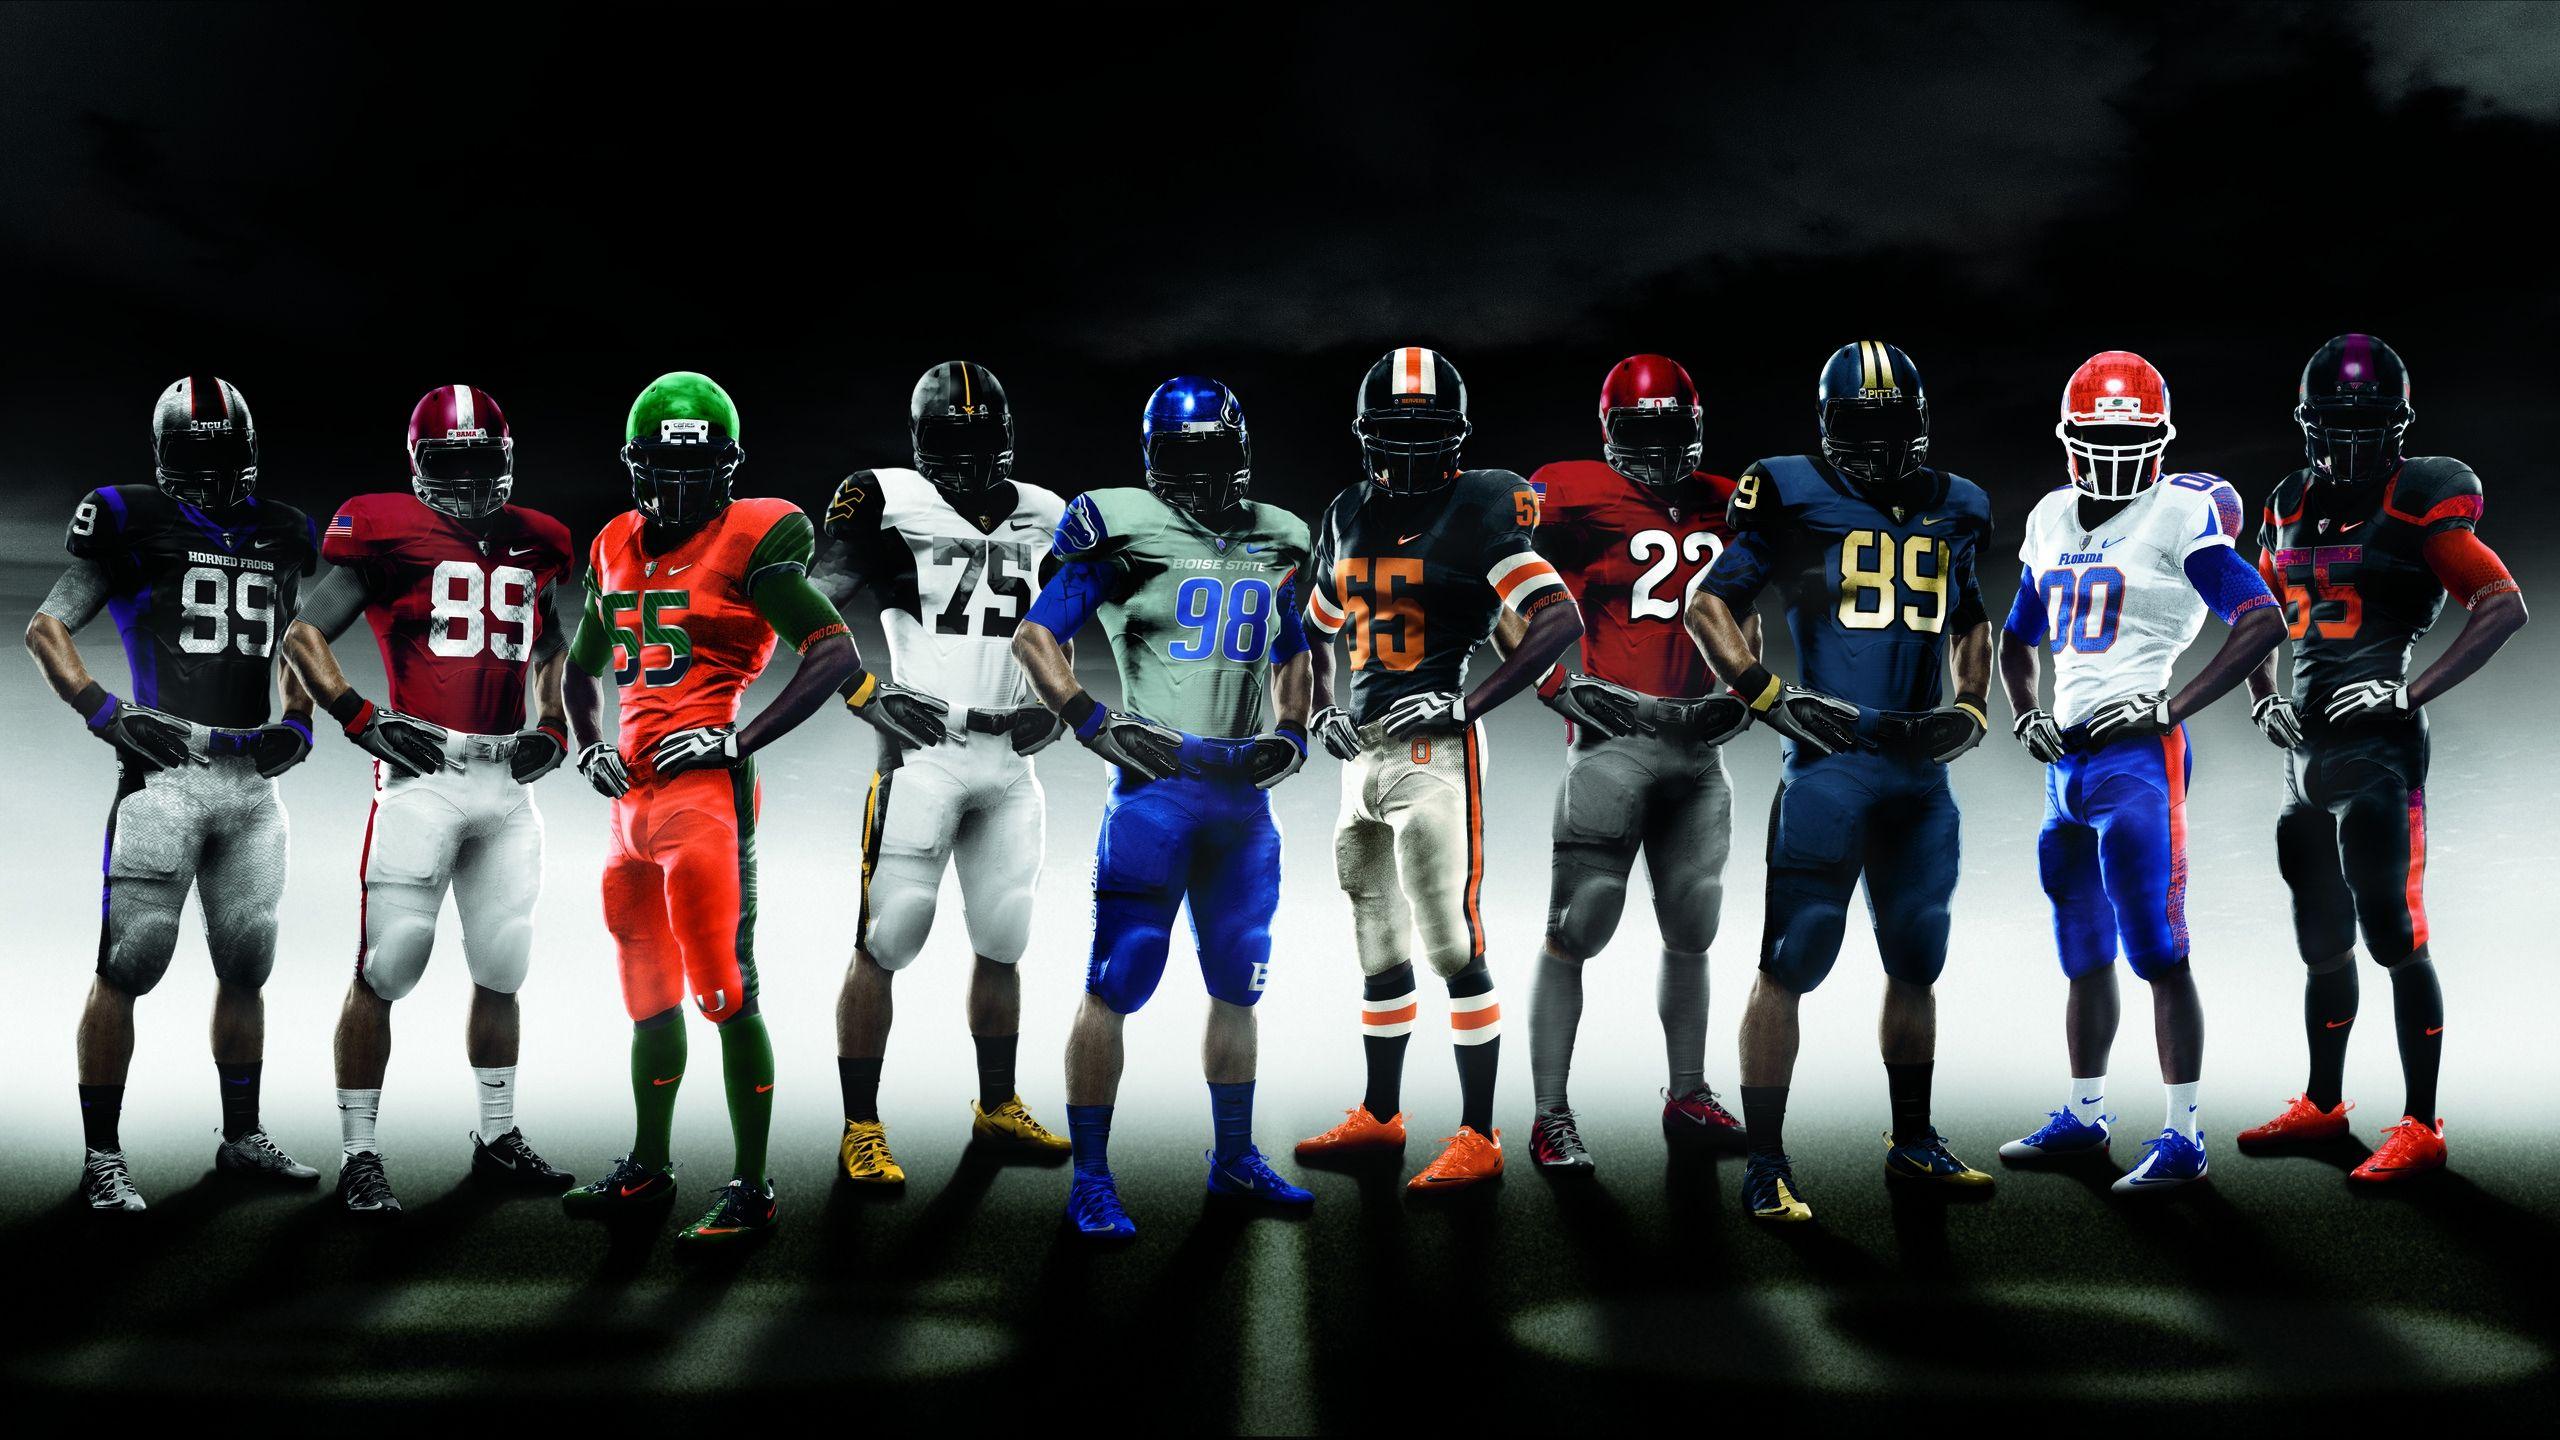 American Football wallpaper   1106928 2560x1440